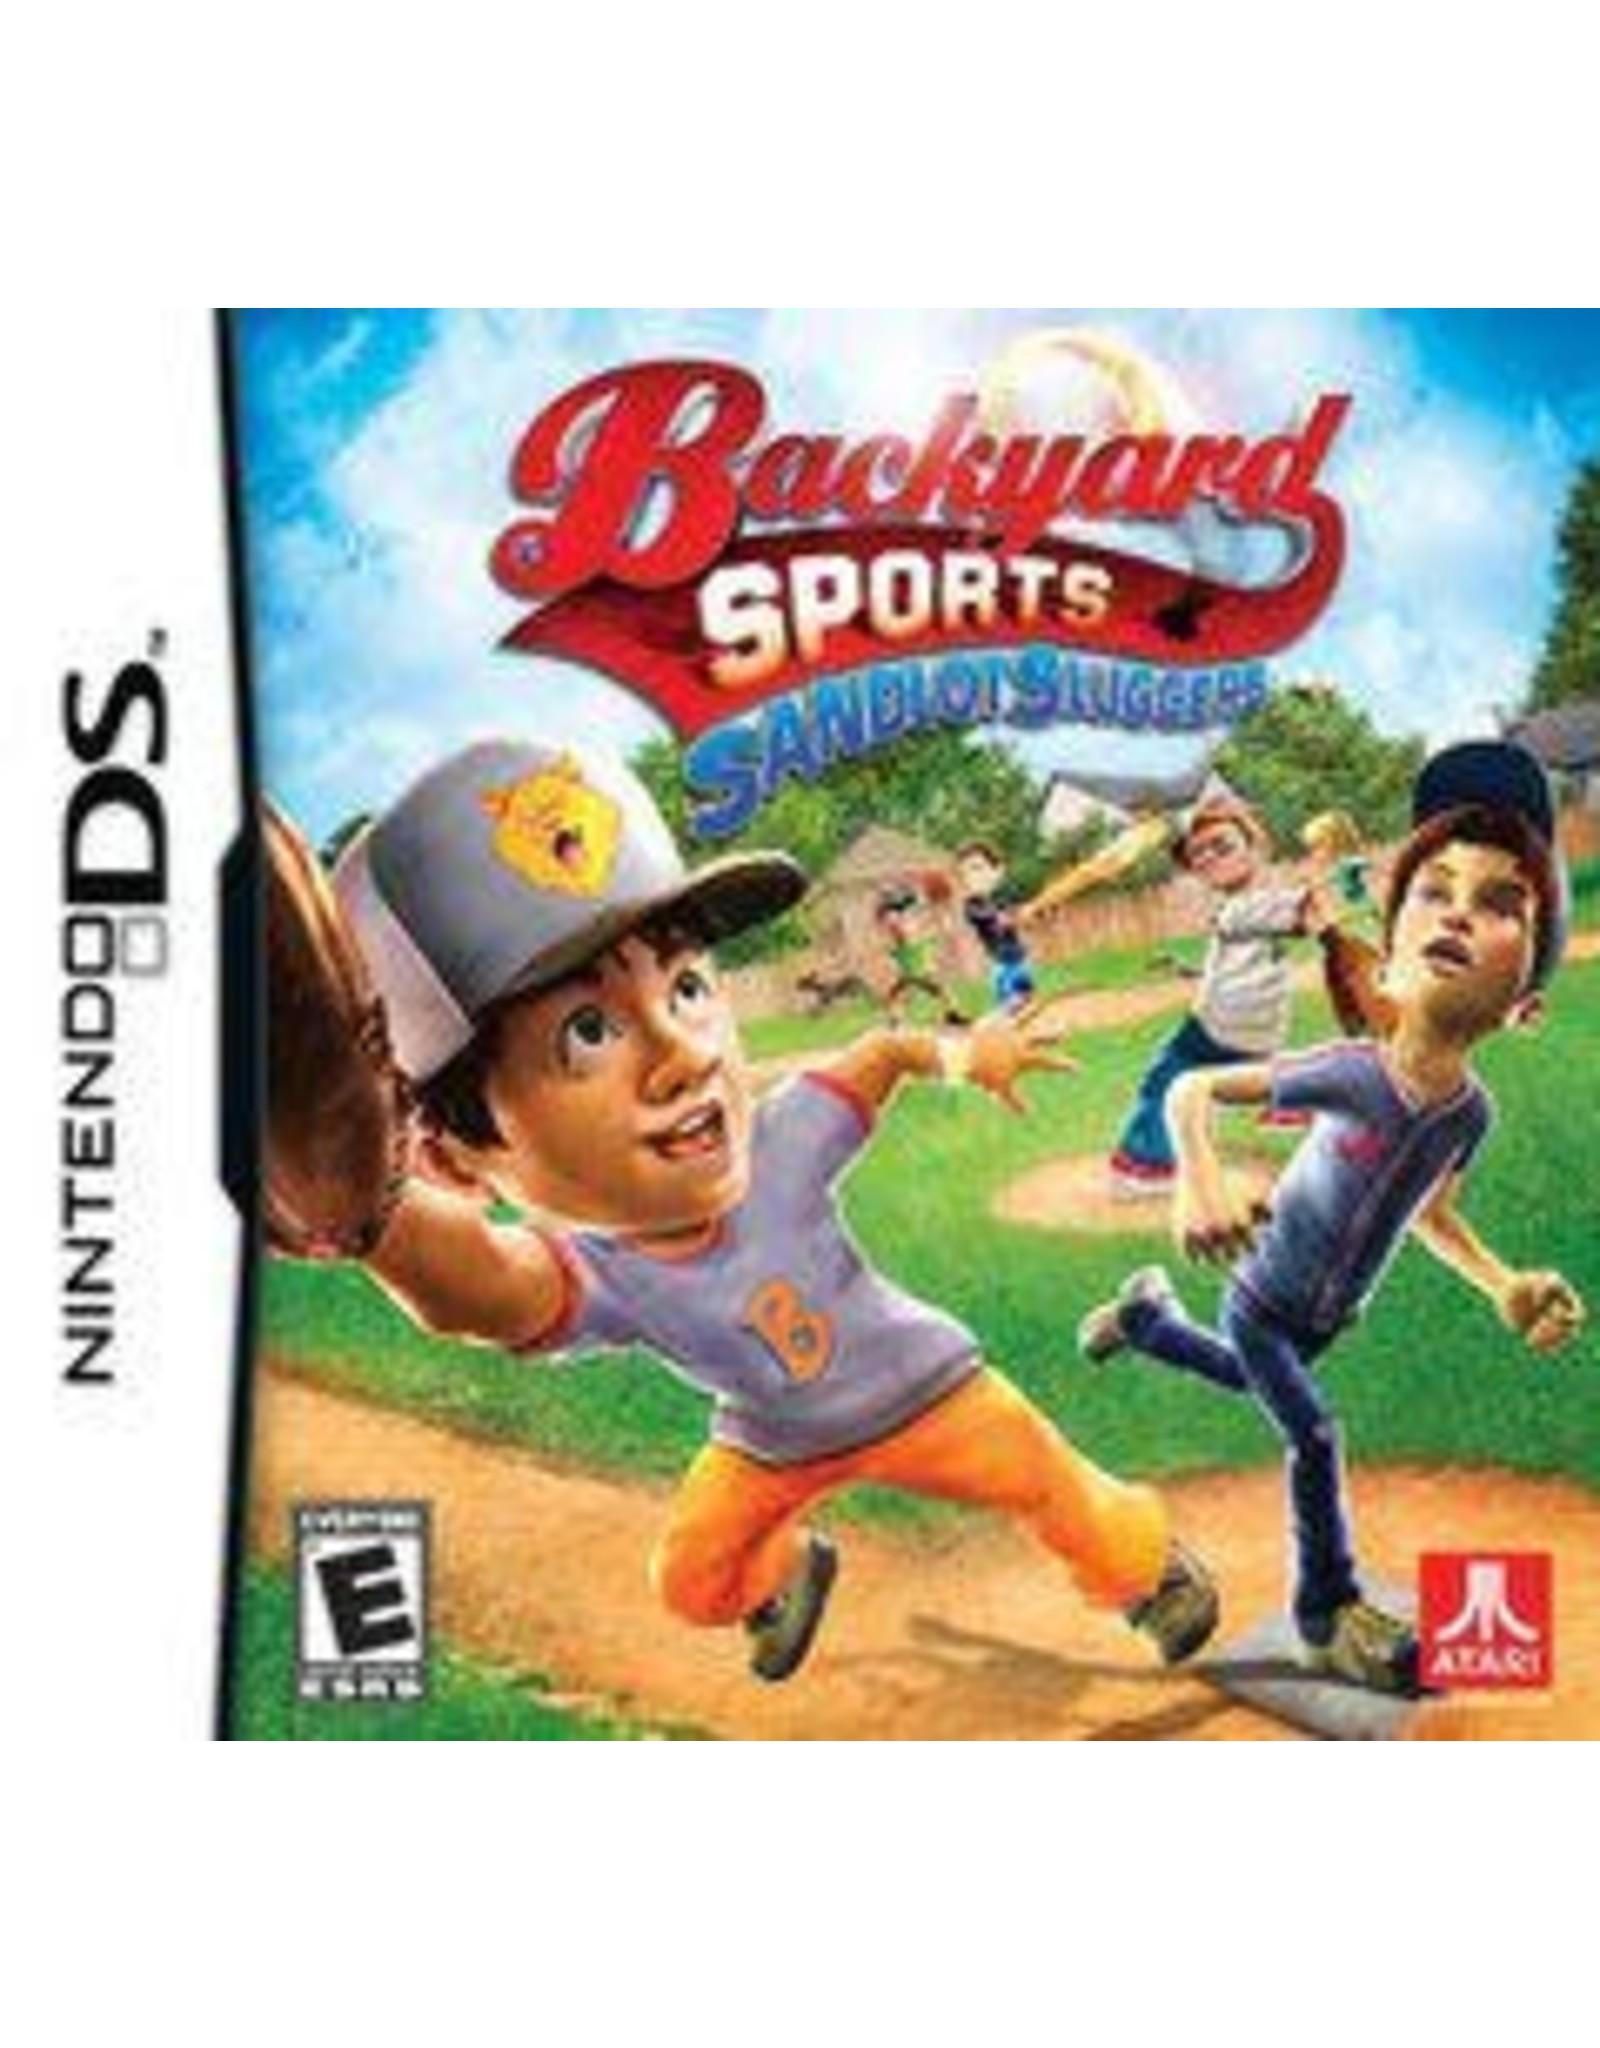 Nintendo DS Backyard Sports: Sandlot Sluggers (Cart Only)